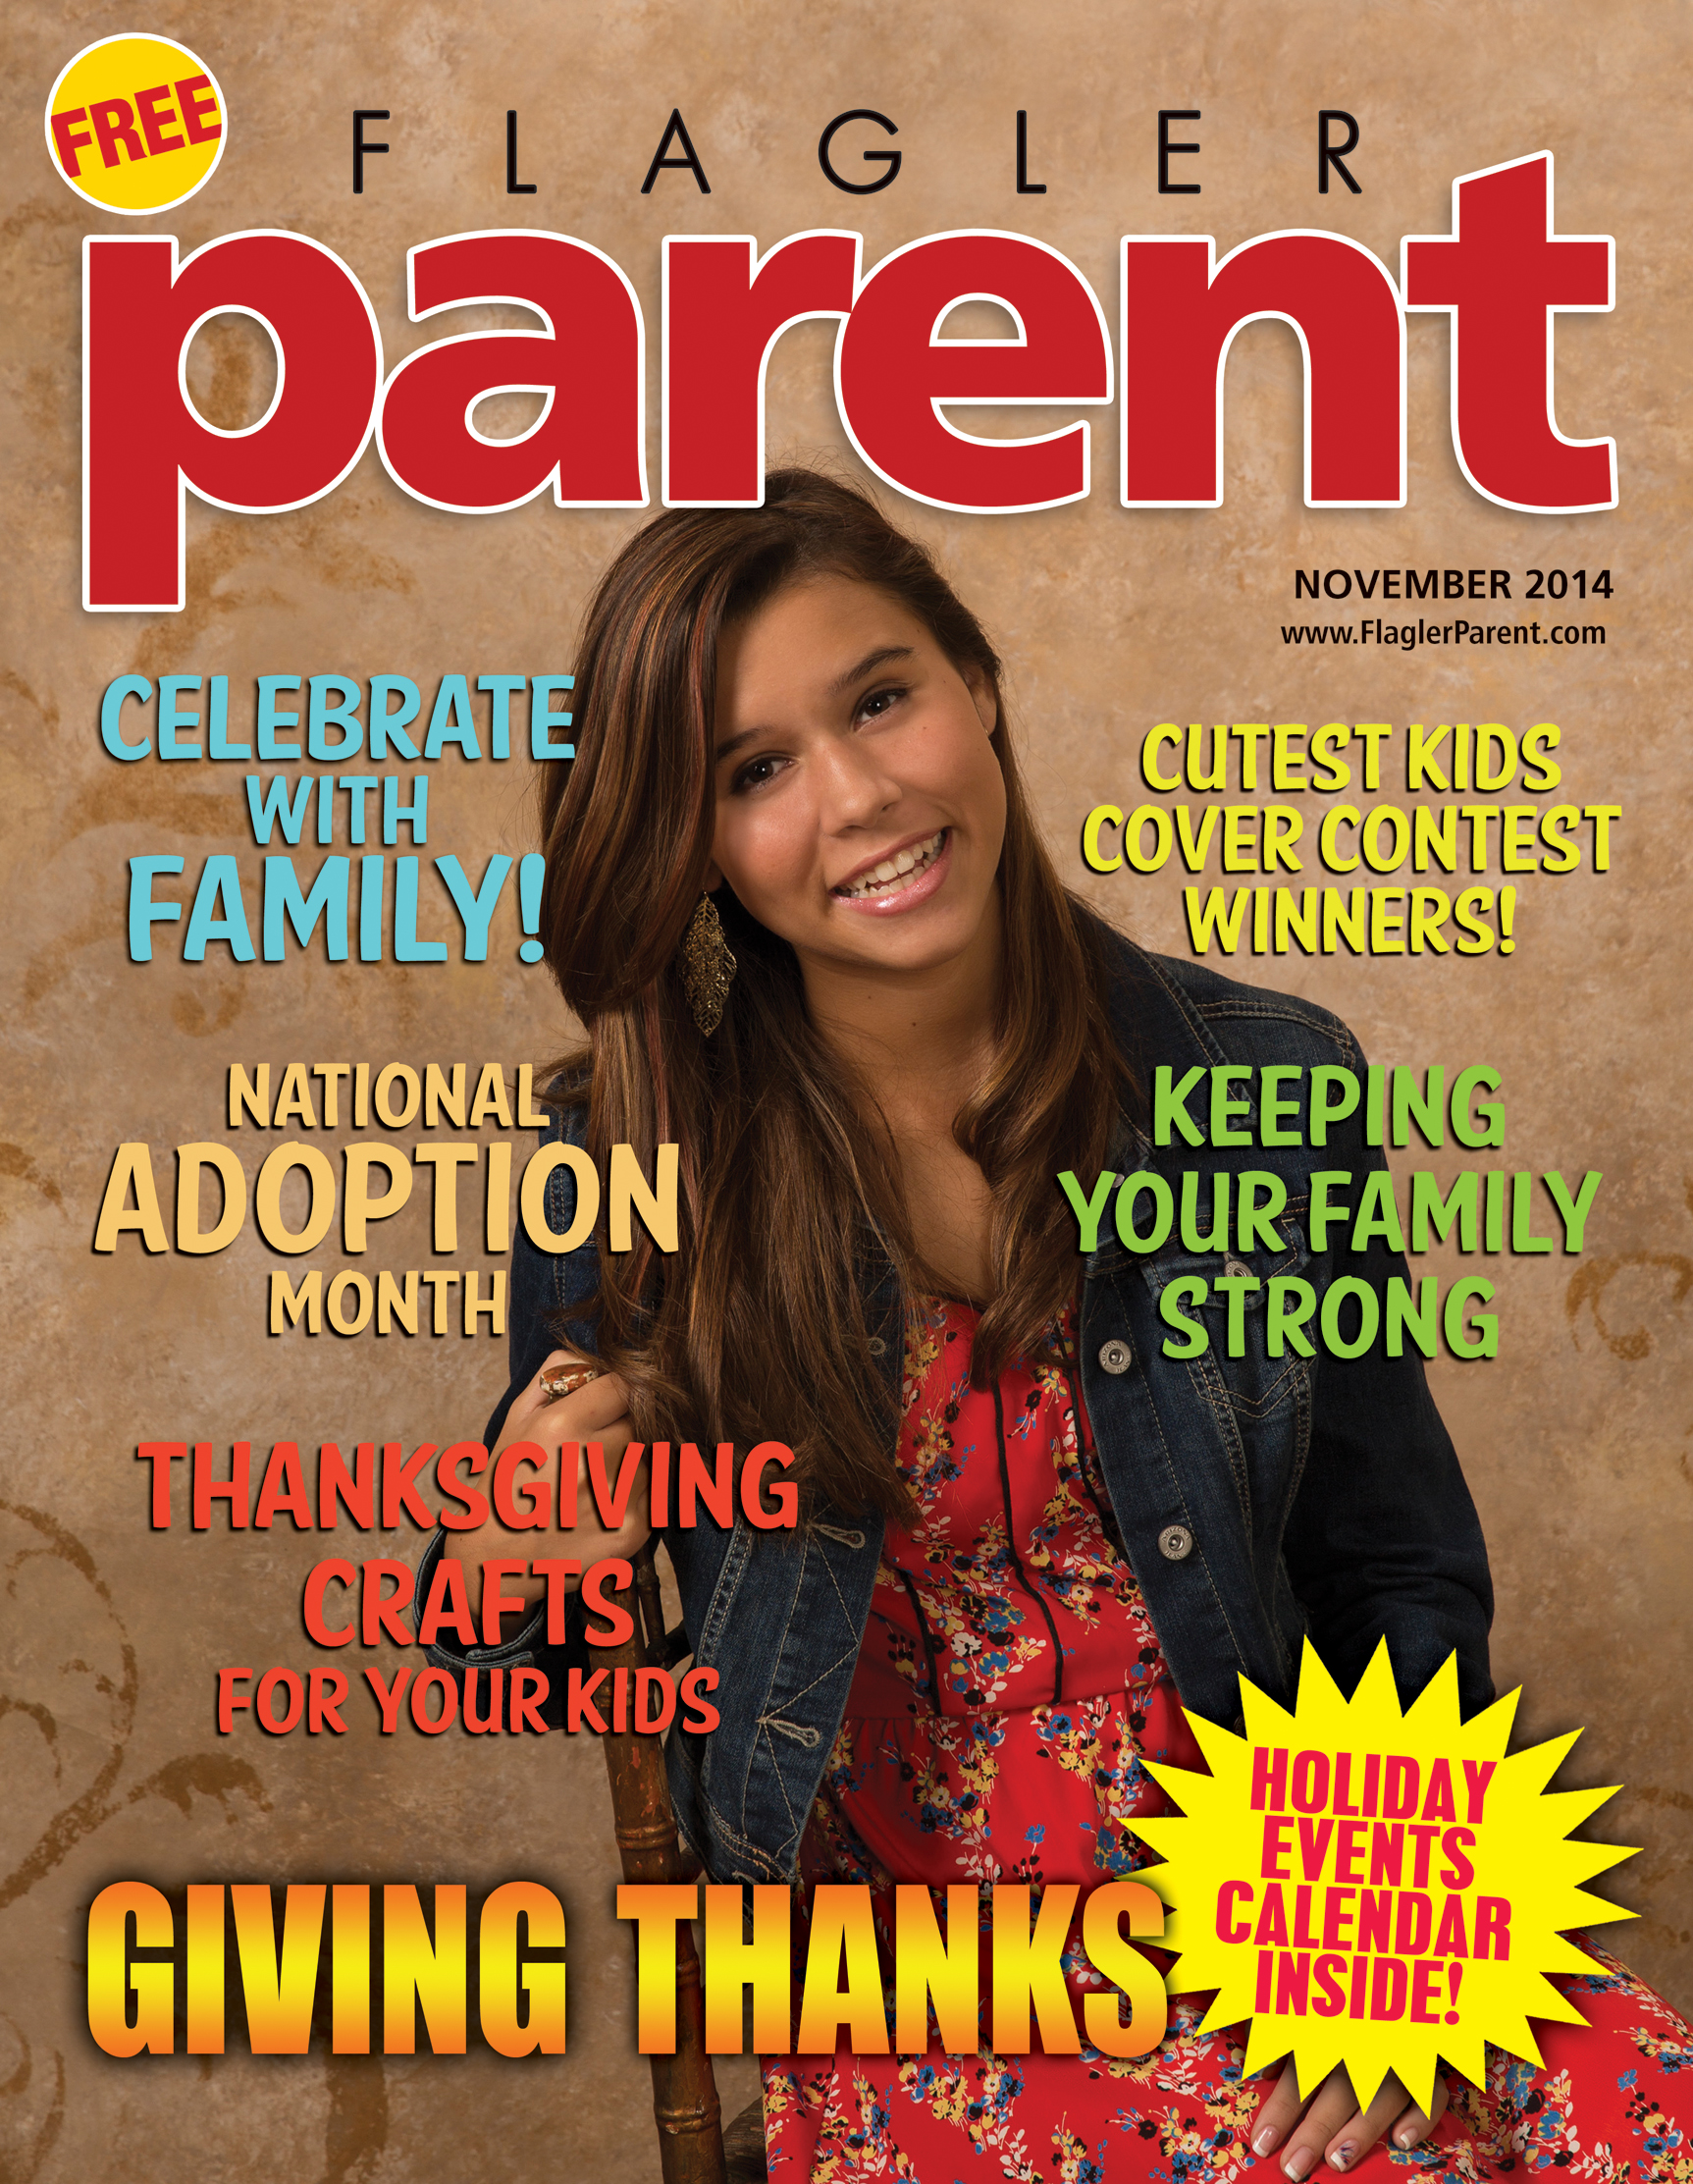 Flagler_Parent_Nov.14_cover-1